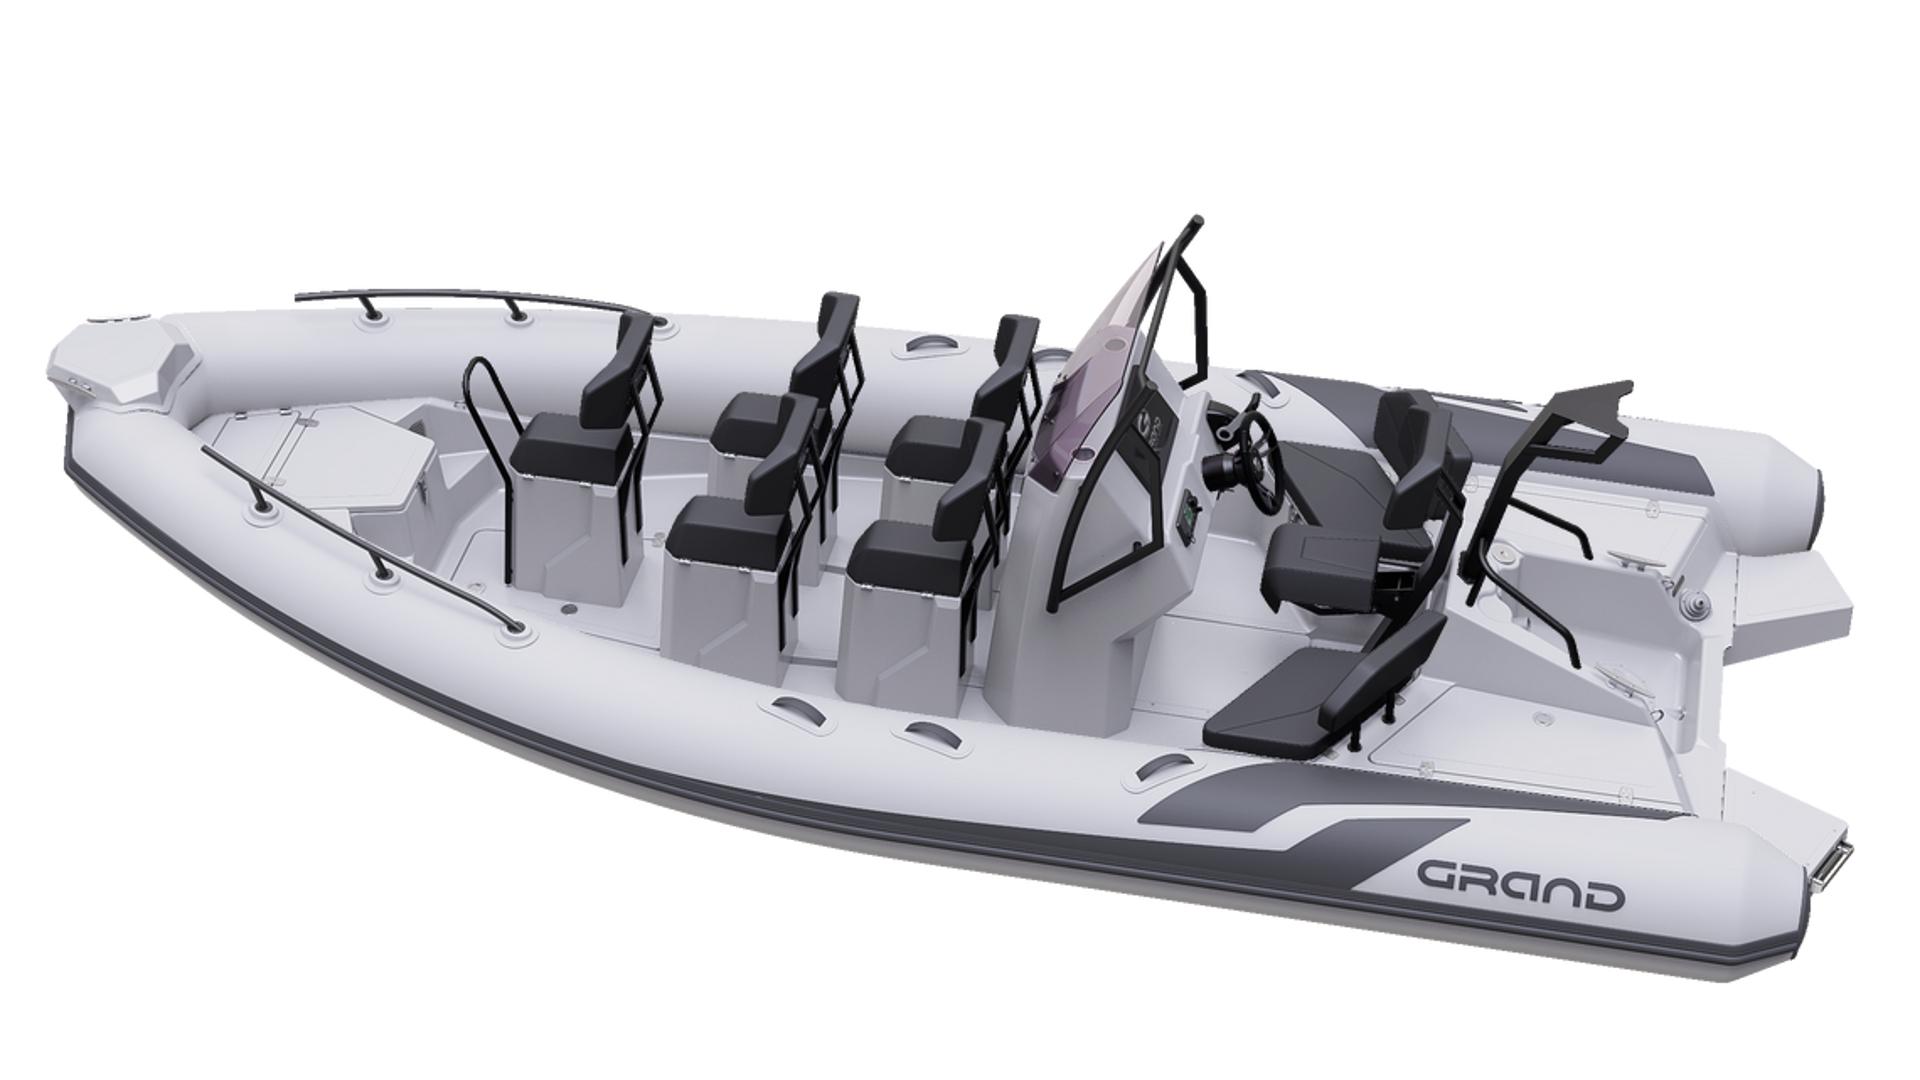 GRAND Drive Line, GRAND Drive, GRAND D600D, GRAND Drive D600 Drive, GRAND RIB, Pro RIB, надувная лодка GRAND Drive D600D, Rigid Inflatable Boats GRAND